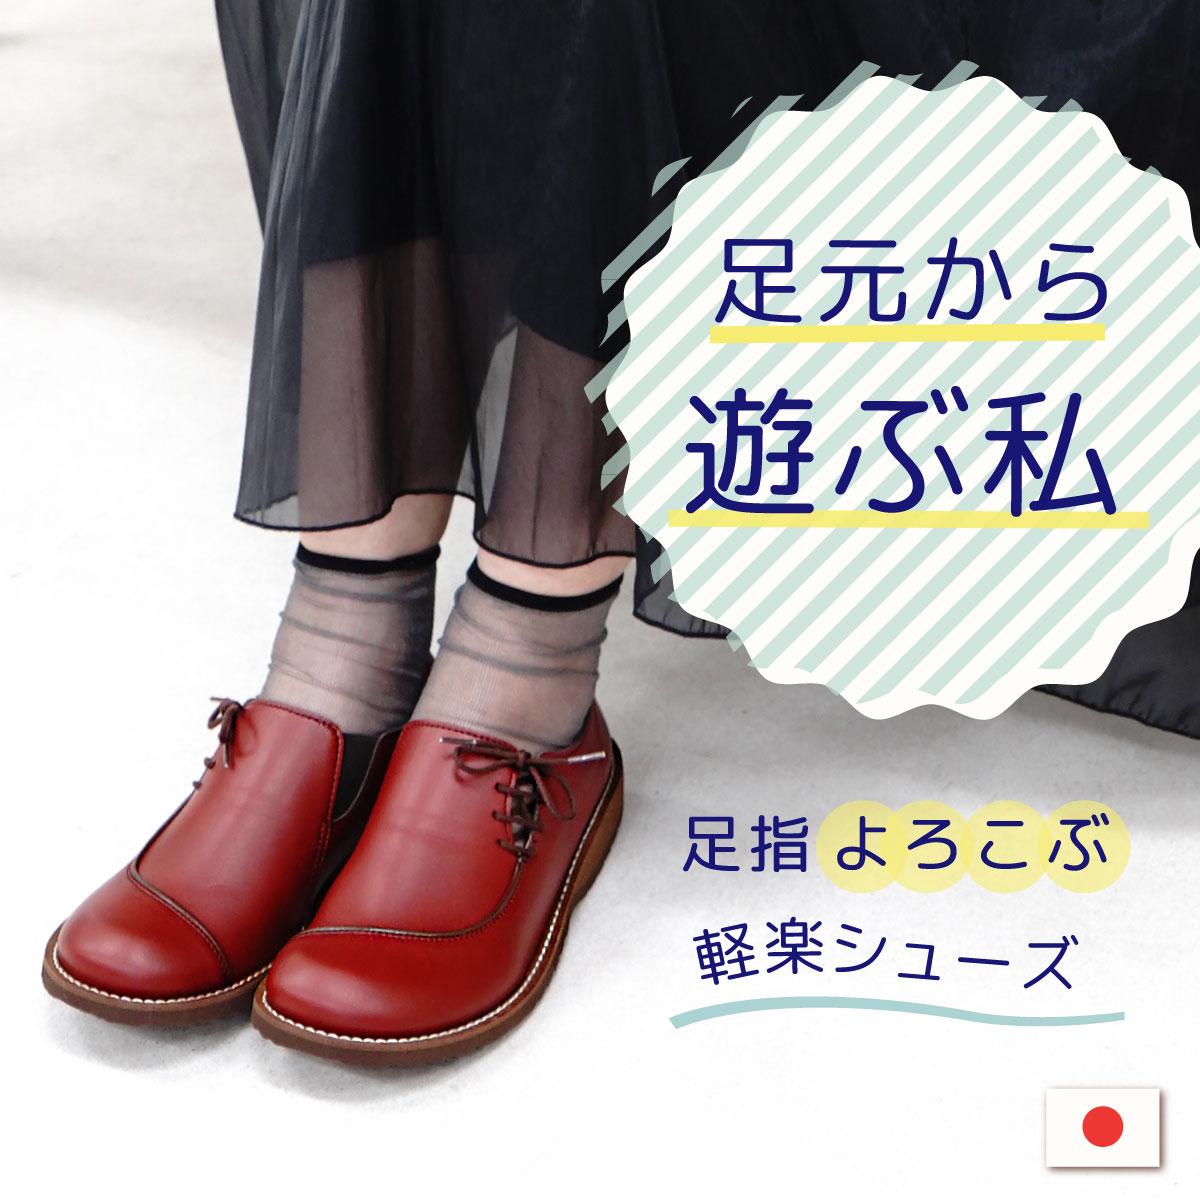 Jモカ スリッポン コンフォートシューズ モカシン カジュアル 国内即発送 LEAFL リーフ 婦人靴 日本製 お気に入